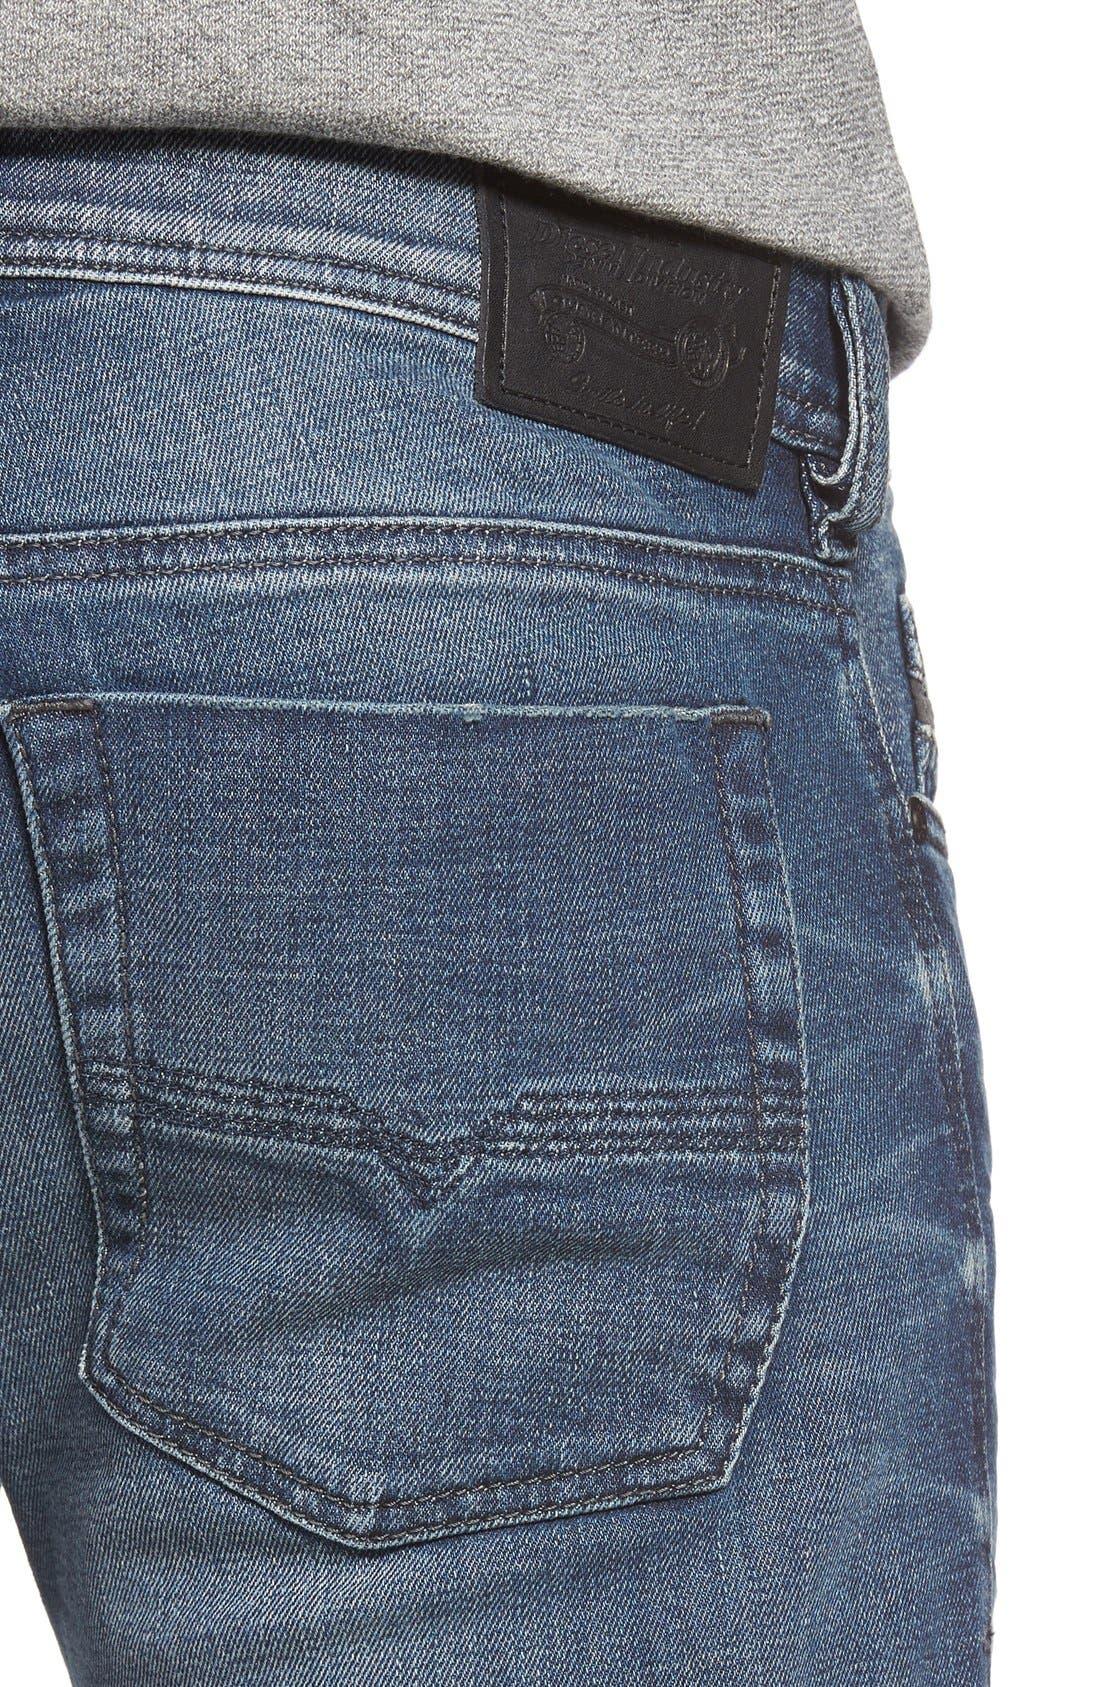 Zatiny Bootcut Jeans,                             Alternate thumbnail 4, color,                             857N